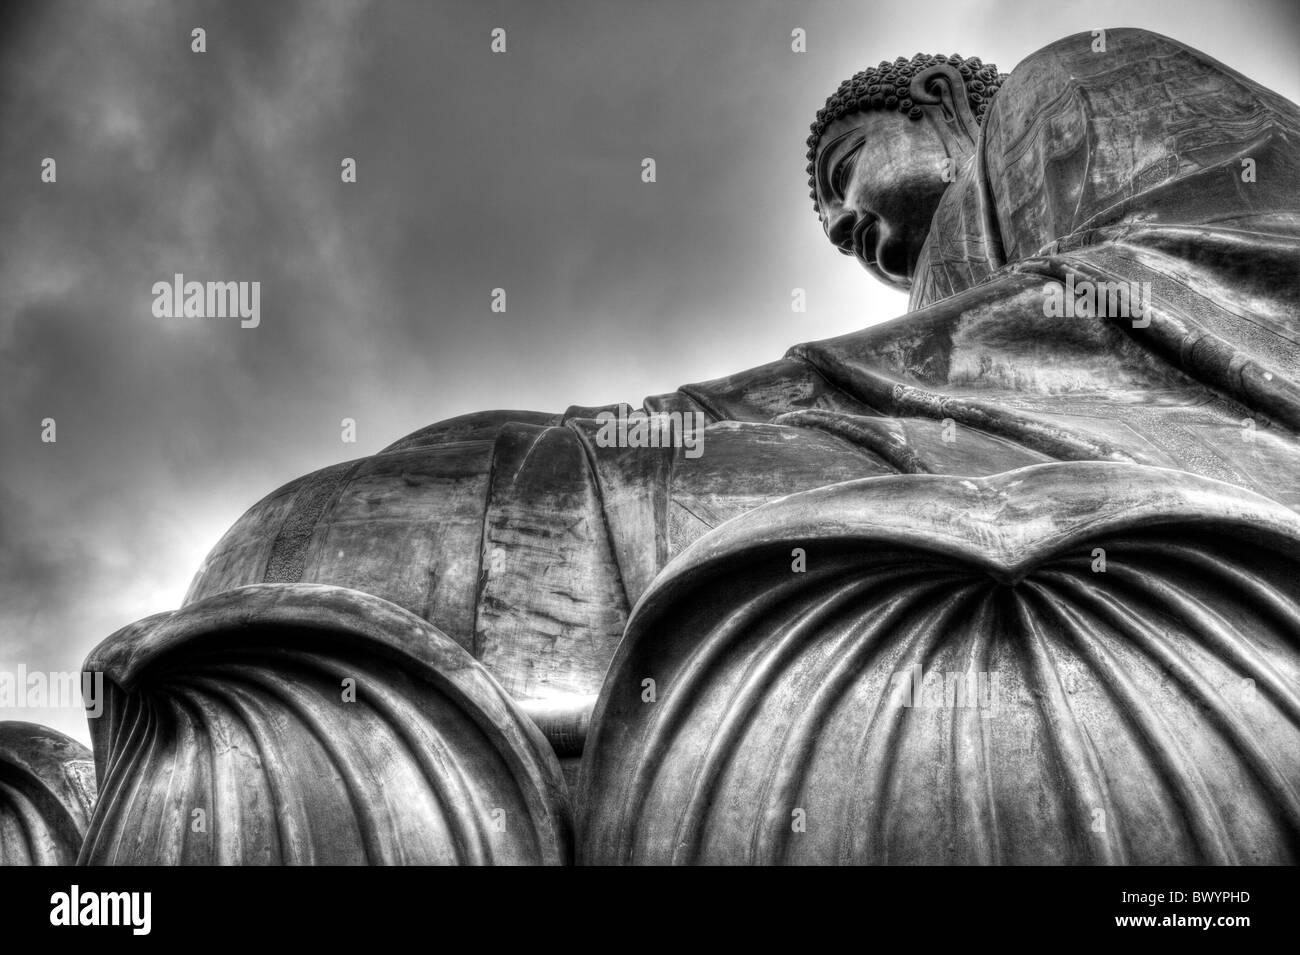 Hong Kong, Lantau island seated bronze statue the Big Buddha - Stock Image